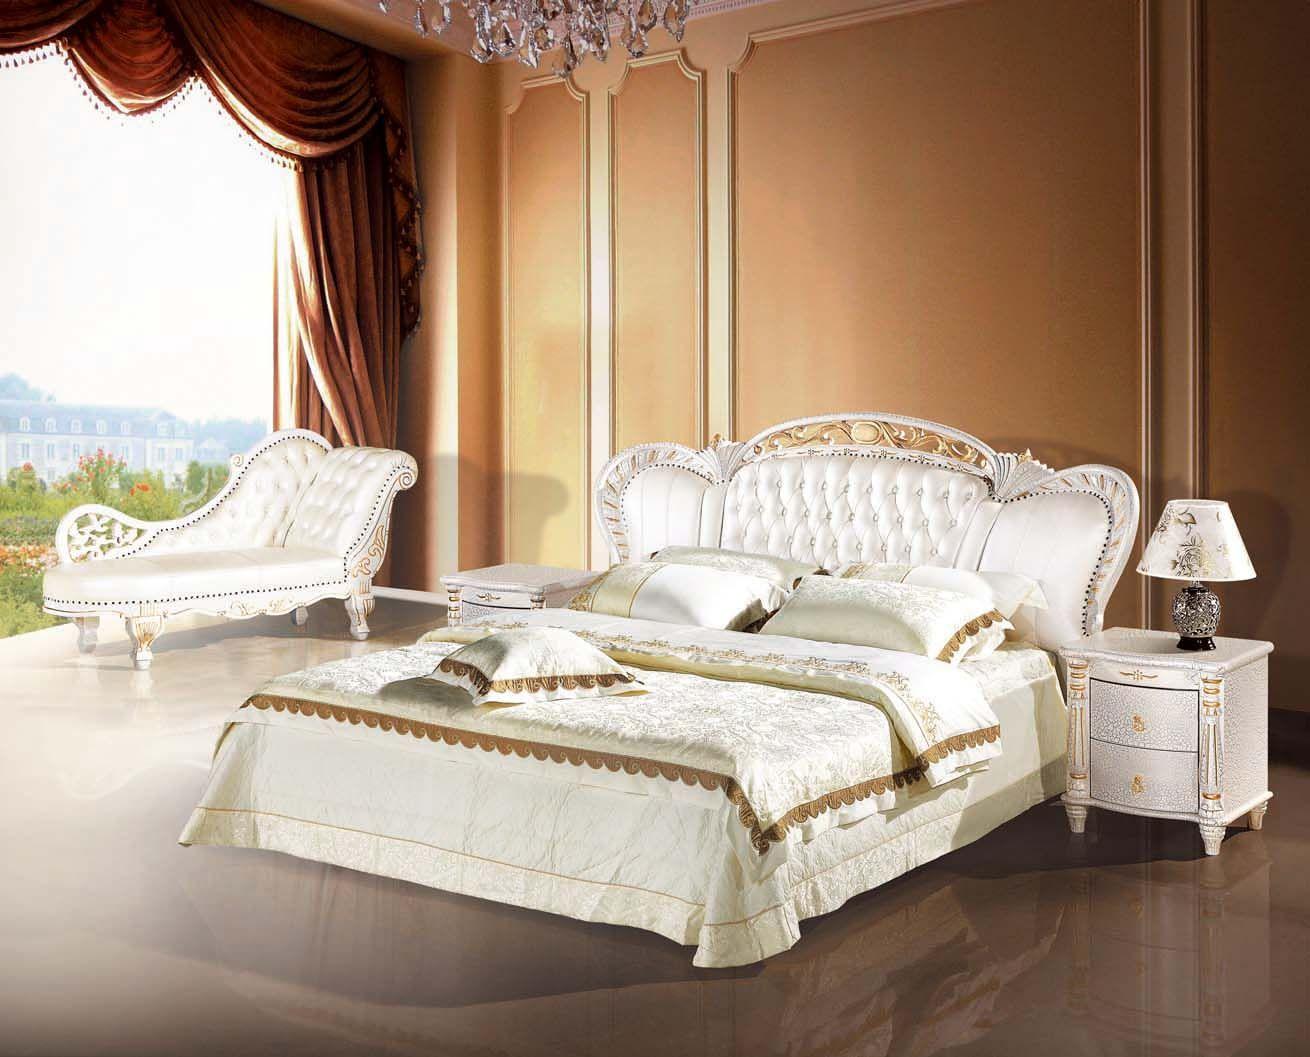 bed furniture image. Solid Wood Bedroom Furniture Sets For More Pictures And Design Ideas, Please Visit My Blog Http://pesonashop.com | Pinterest Bed Image D